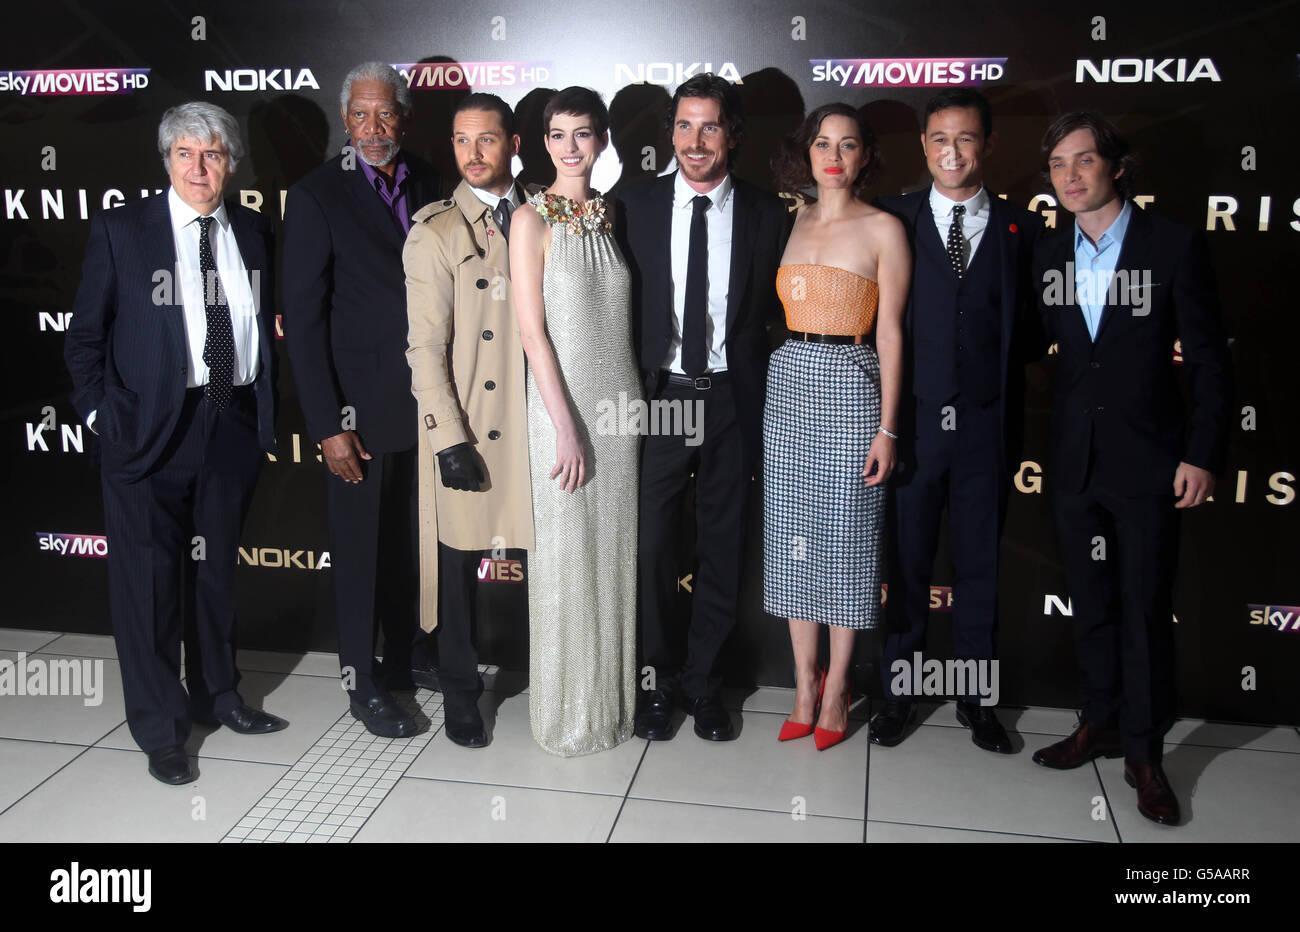 Batman The Dark Knight Rises Premiere London Stock Photo